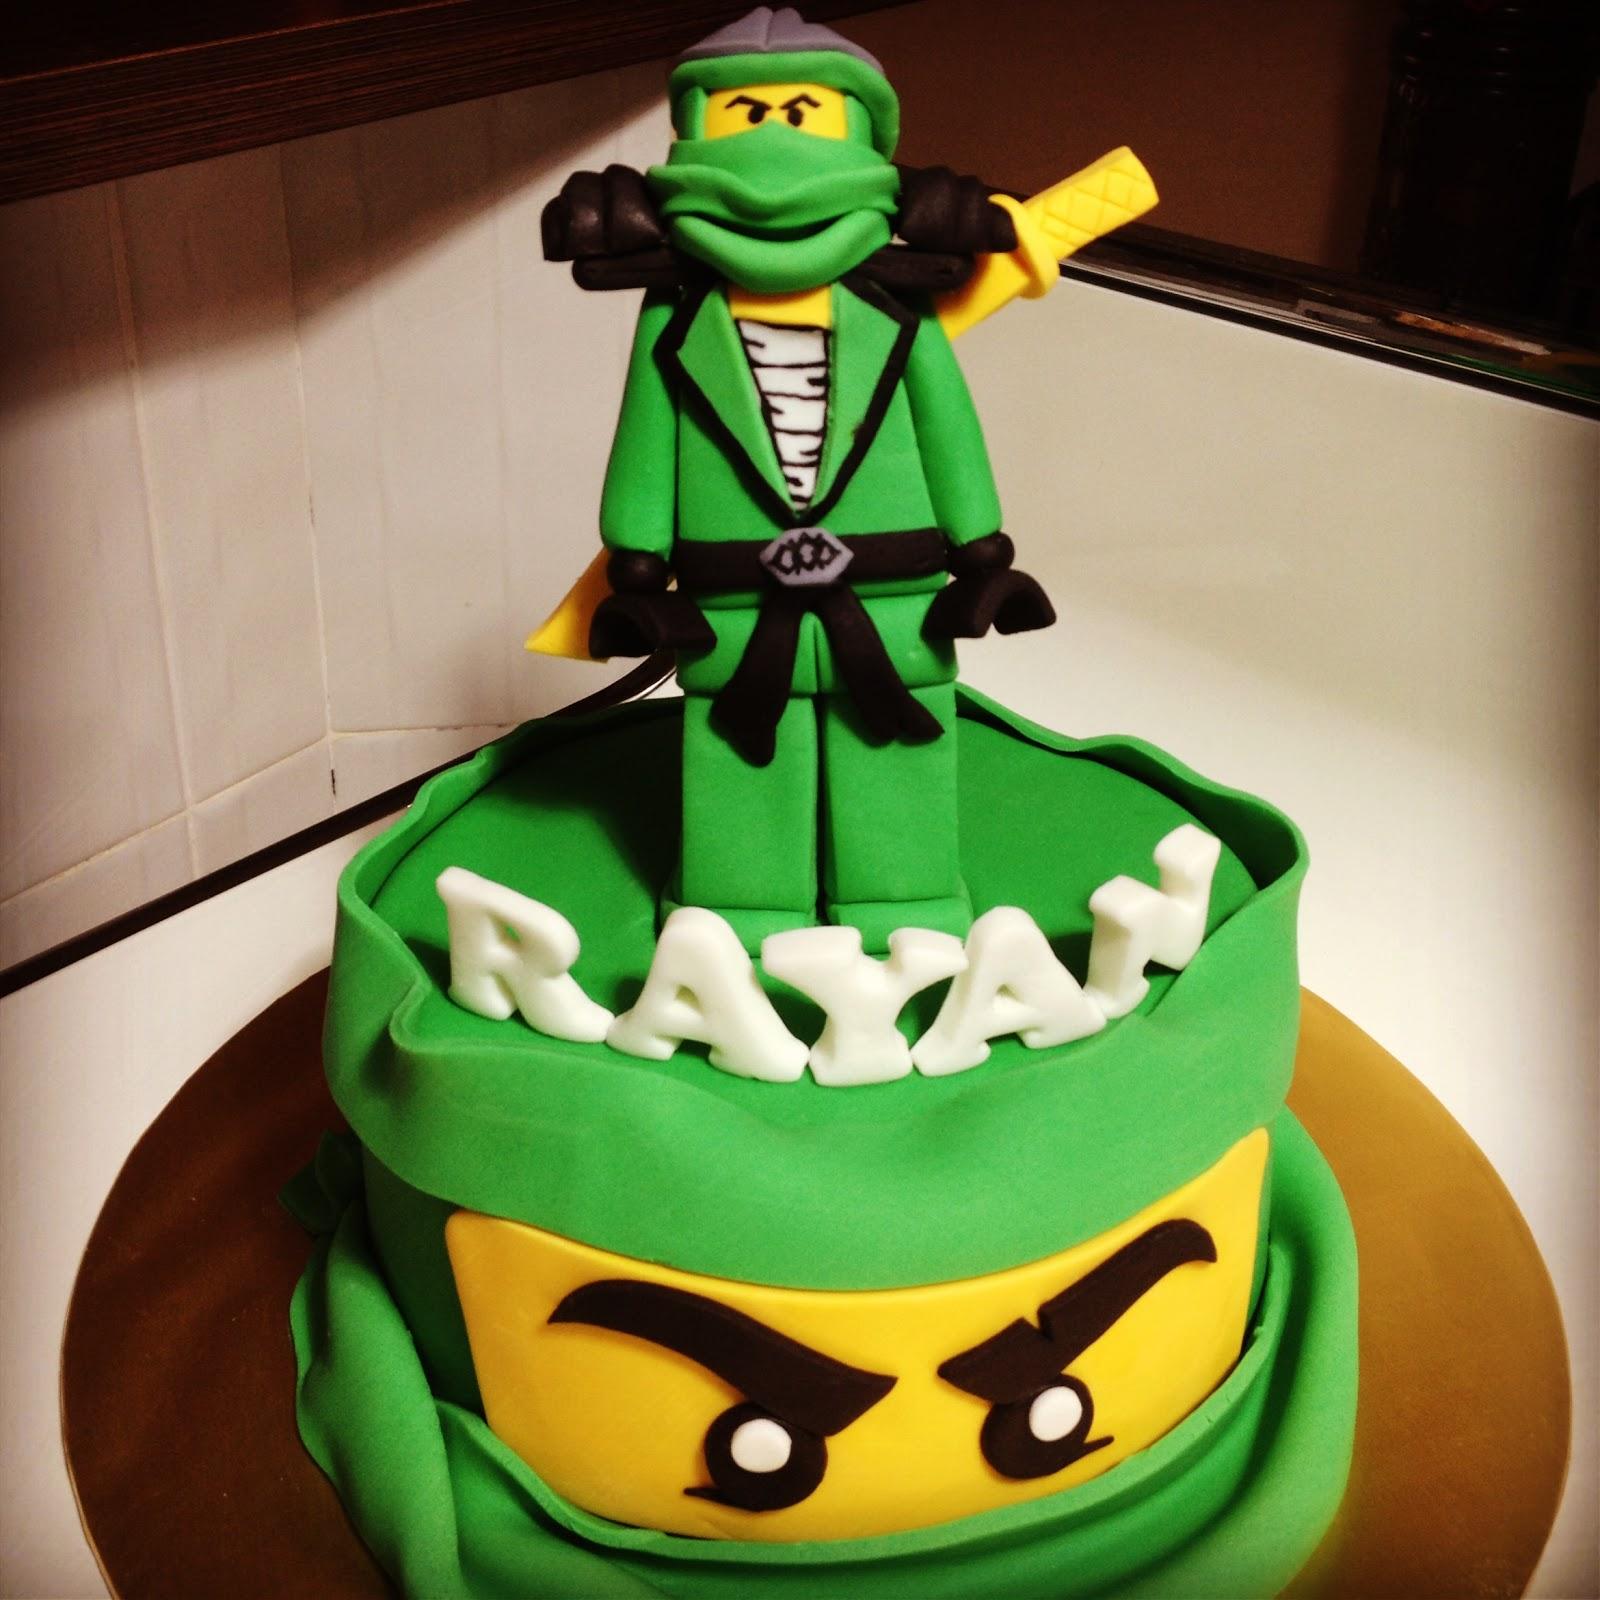 Comelicious Lego Ninjago Lloyd Zx Cake